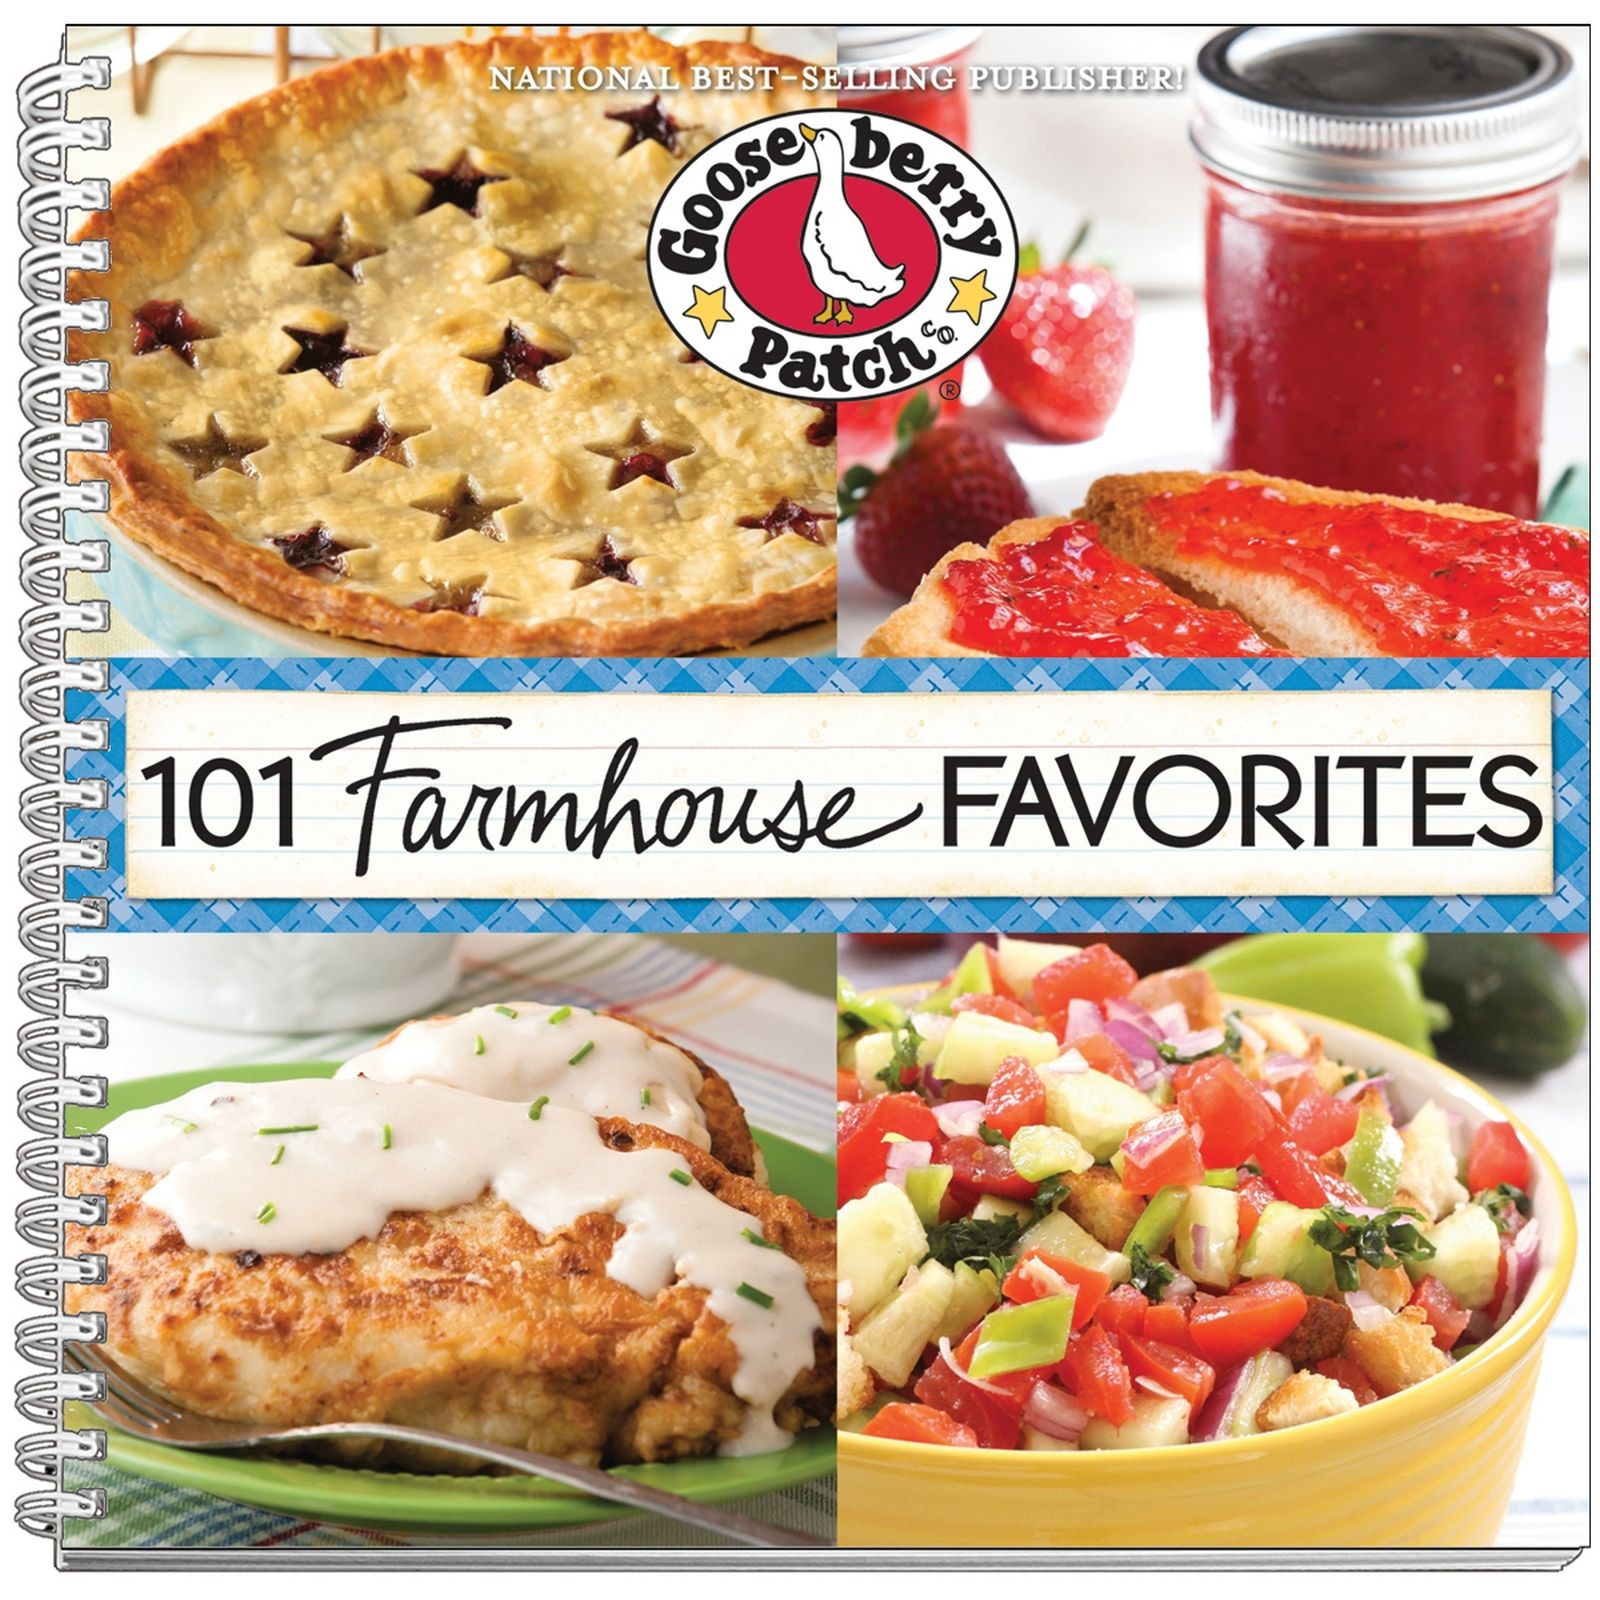 Gooseberry Patch 101 Farmhouse Favorite Recipes Cookbook